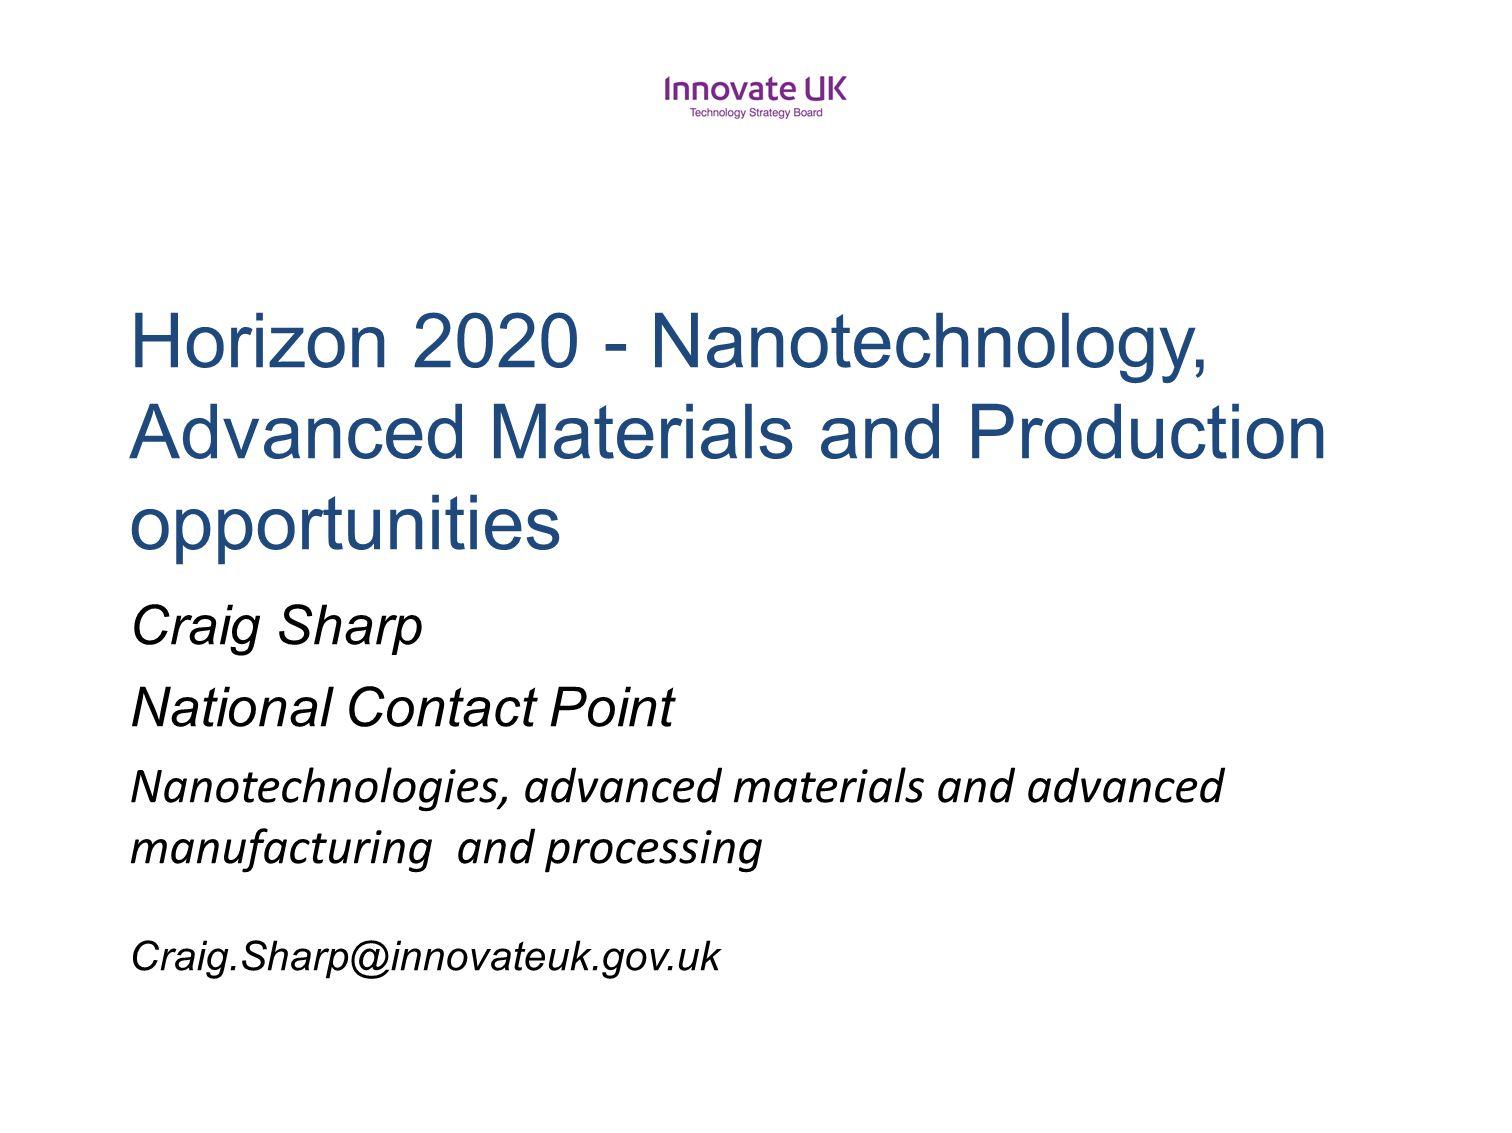 H2020UK Horizon 2020 - Nanotechnology, Advanced Materials and Production opportunities Craig Sharp National Contact Point Nanotechnologies, advanced materials and advanced manufacturing and processing Craig.Sharp@innovateuk.gov.uk